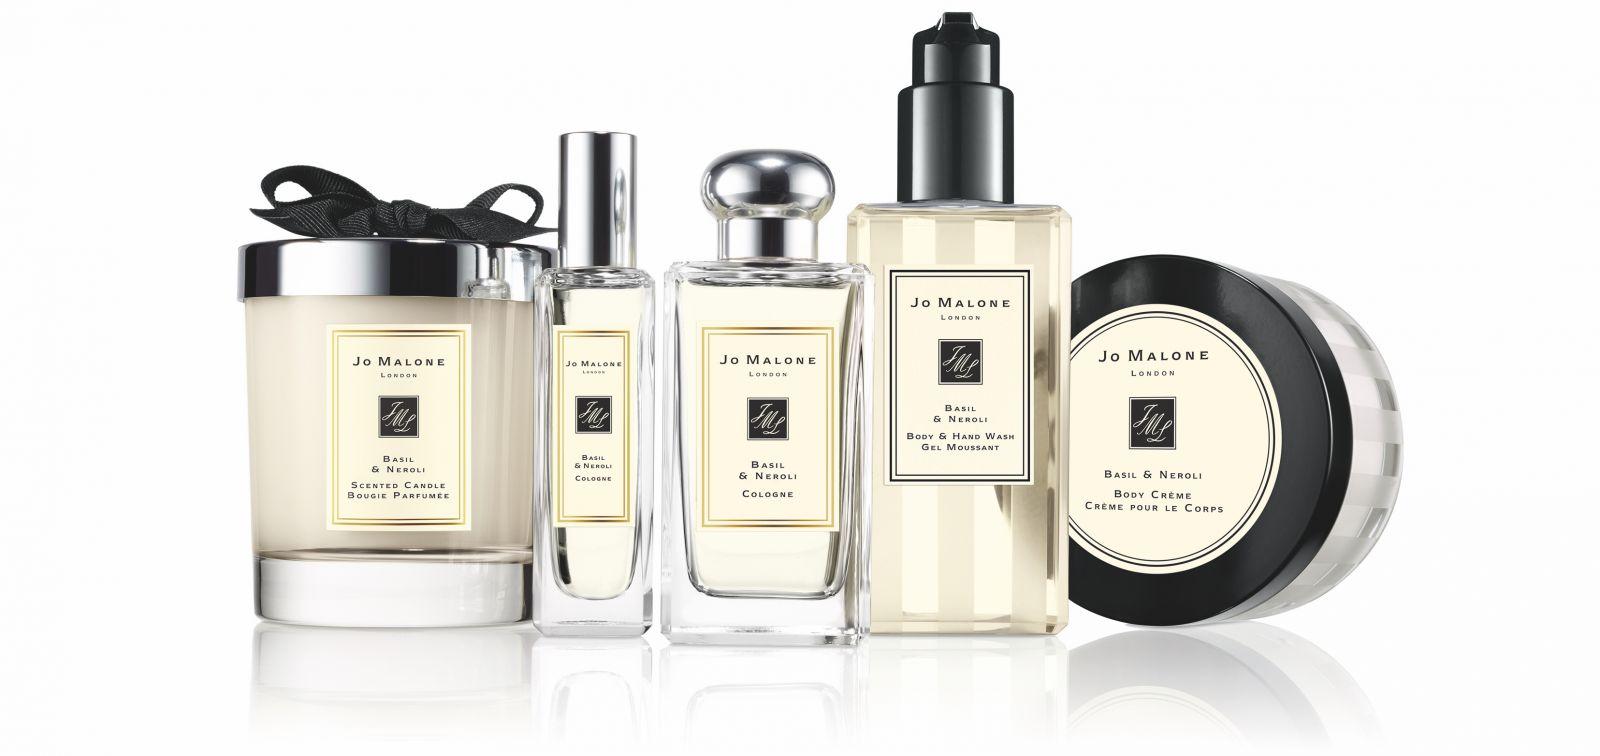 Директор по парфюмерии Jo Malone London рассказала о новом аромате бренда - Basil and Neroli